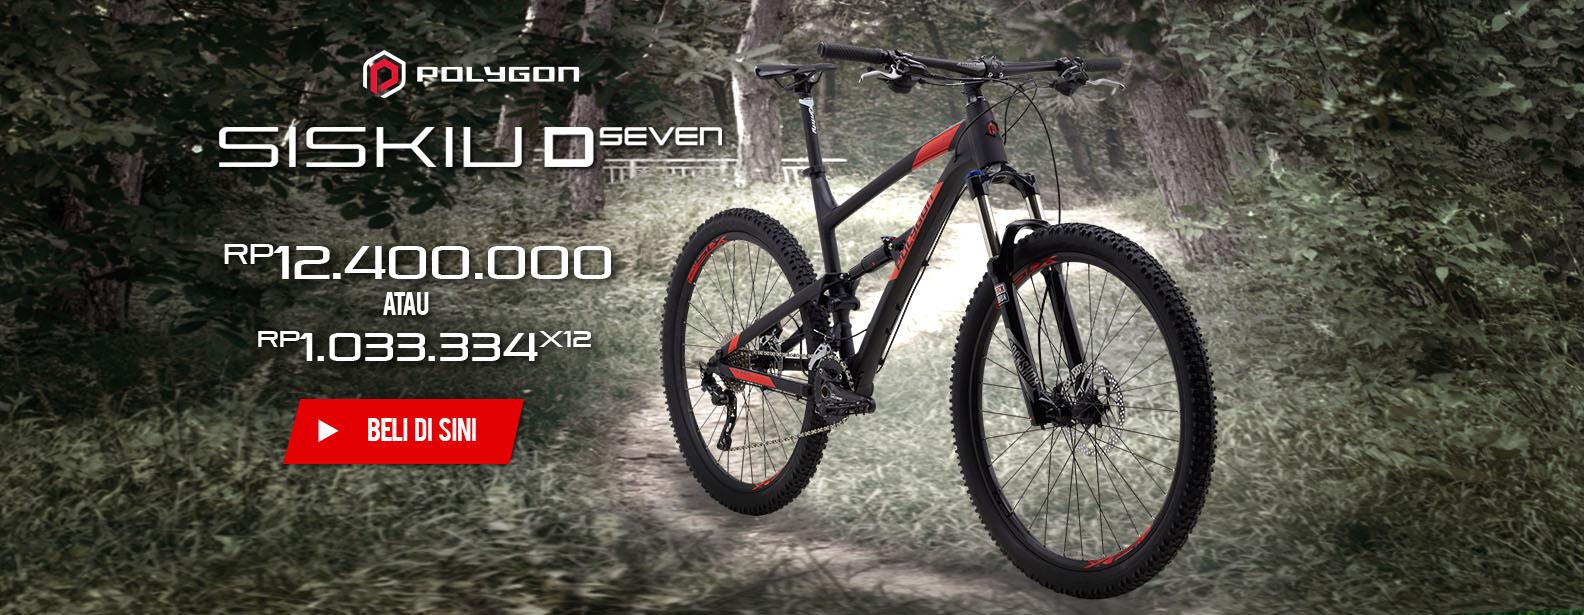 Polygon Sepeda MTB Siskiu D7